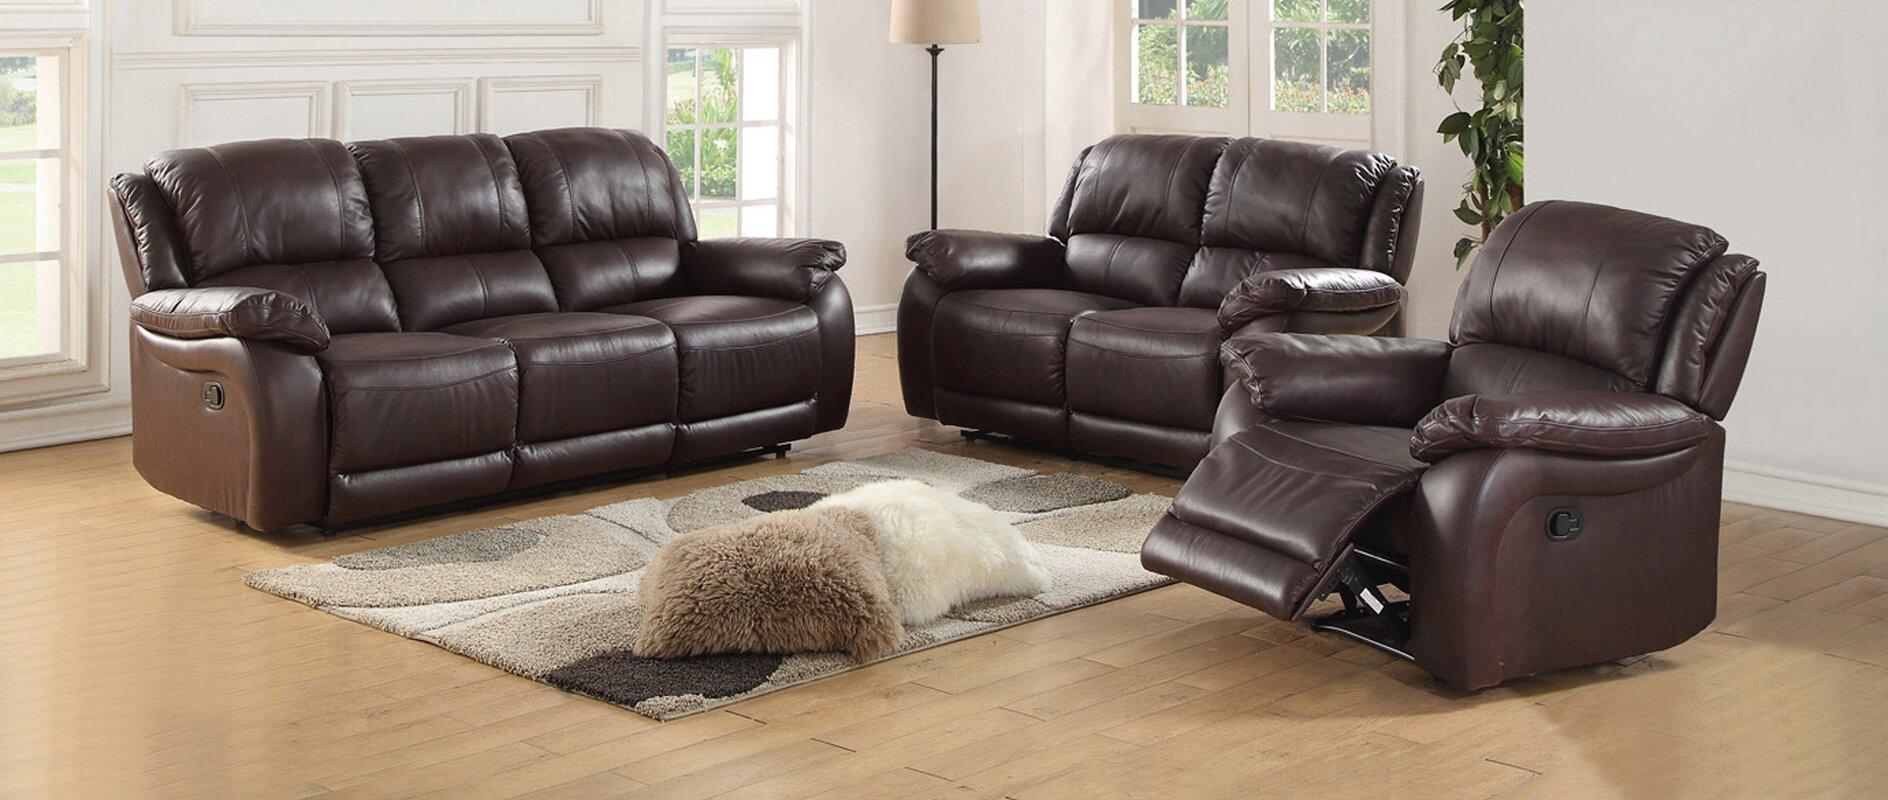 three piece living room set. Juan 3 Piece Leather Living Room Set Latitude Run  Reviews Wayfair